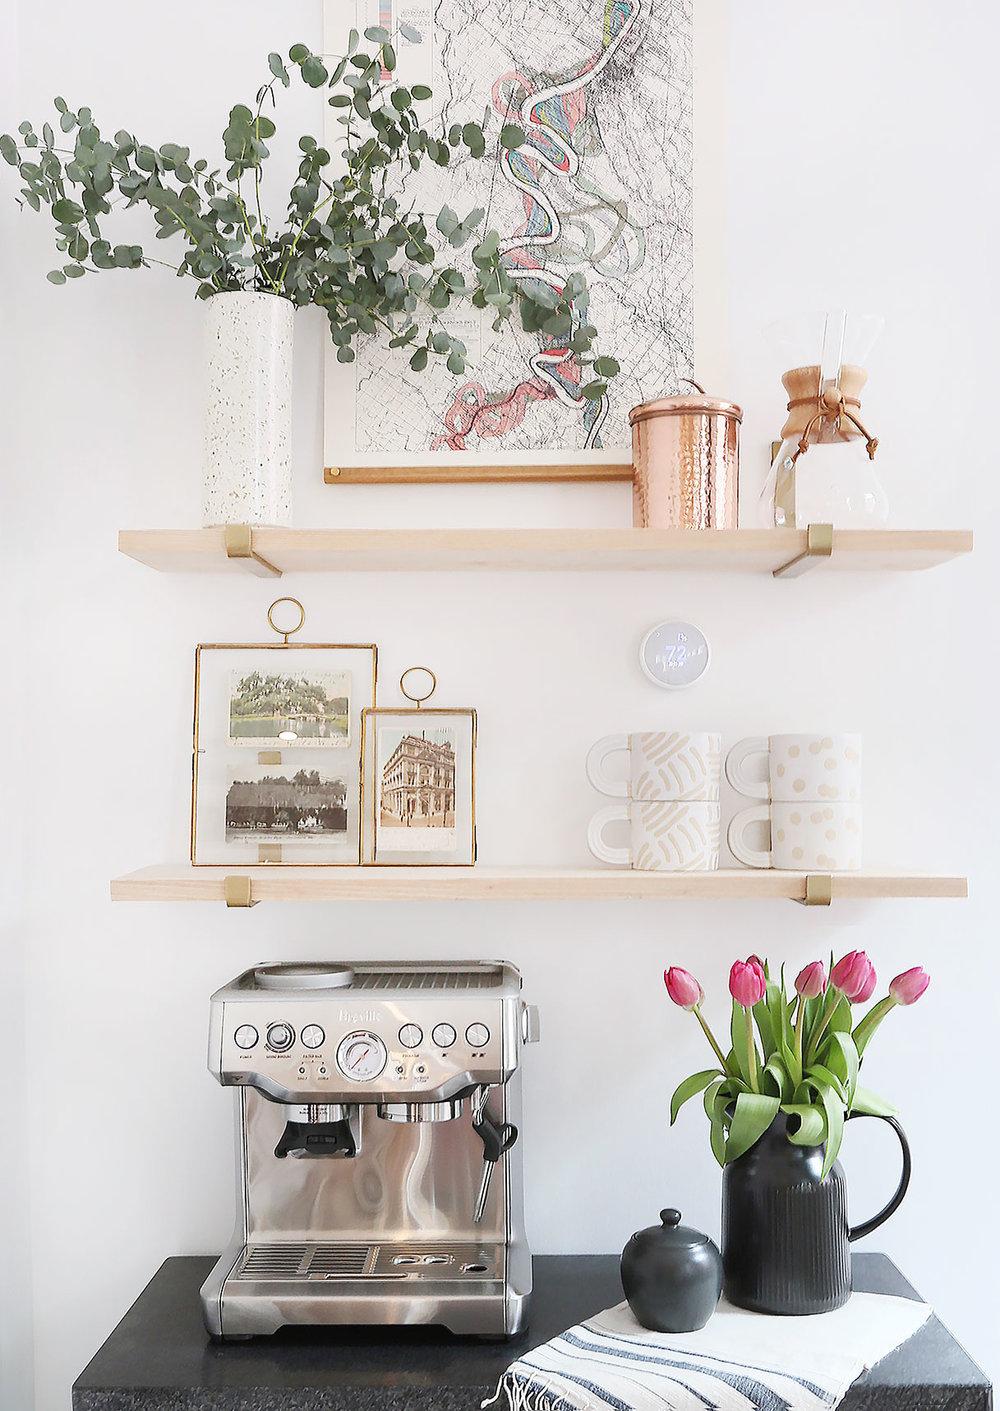 big-side-kitchen-7-low.jpg